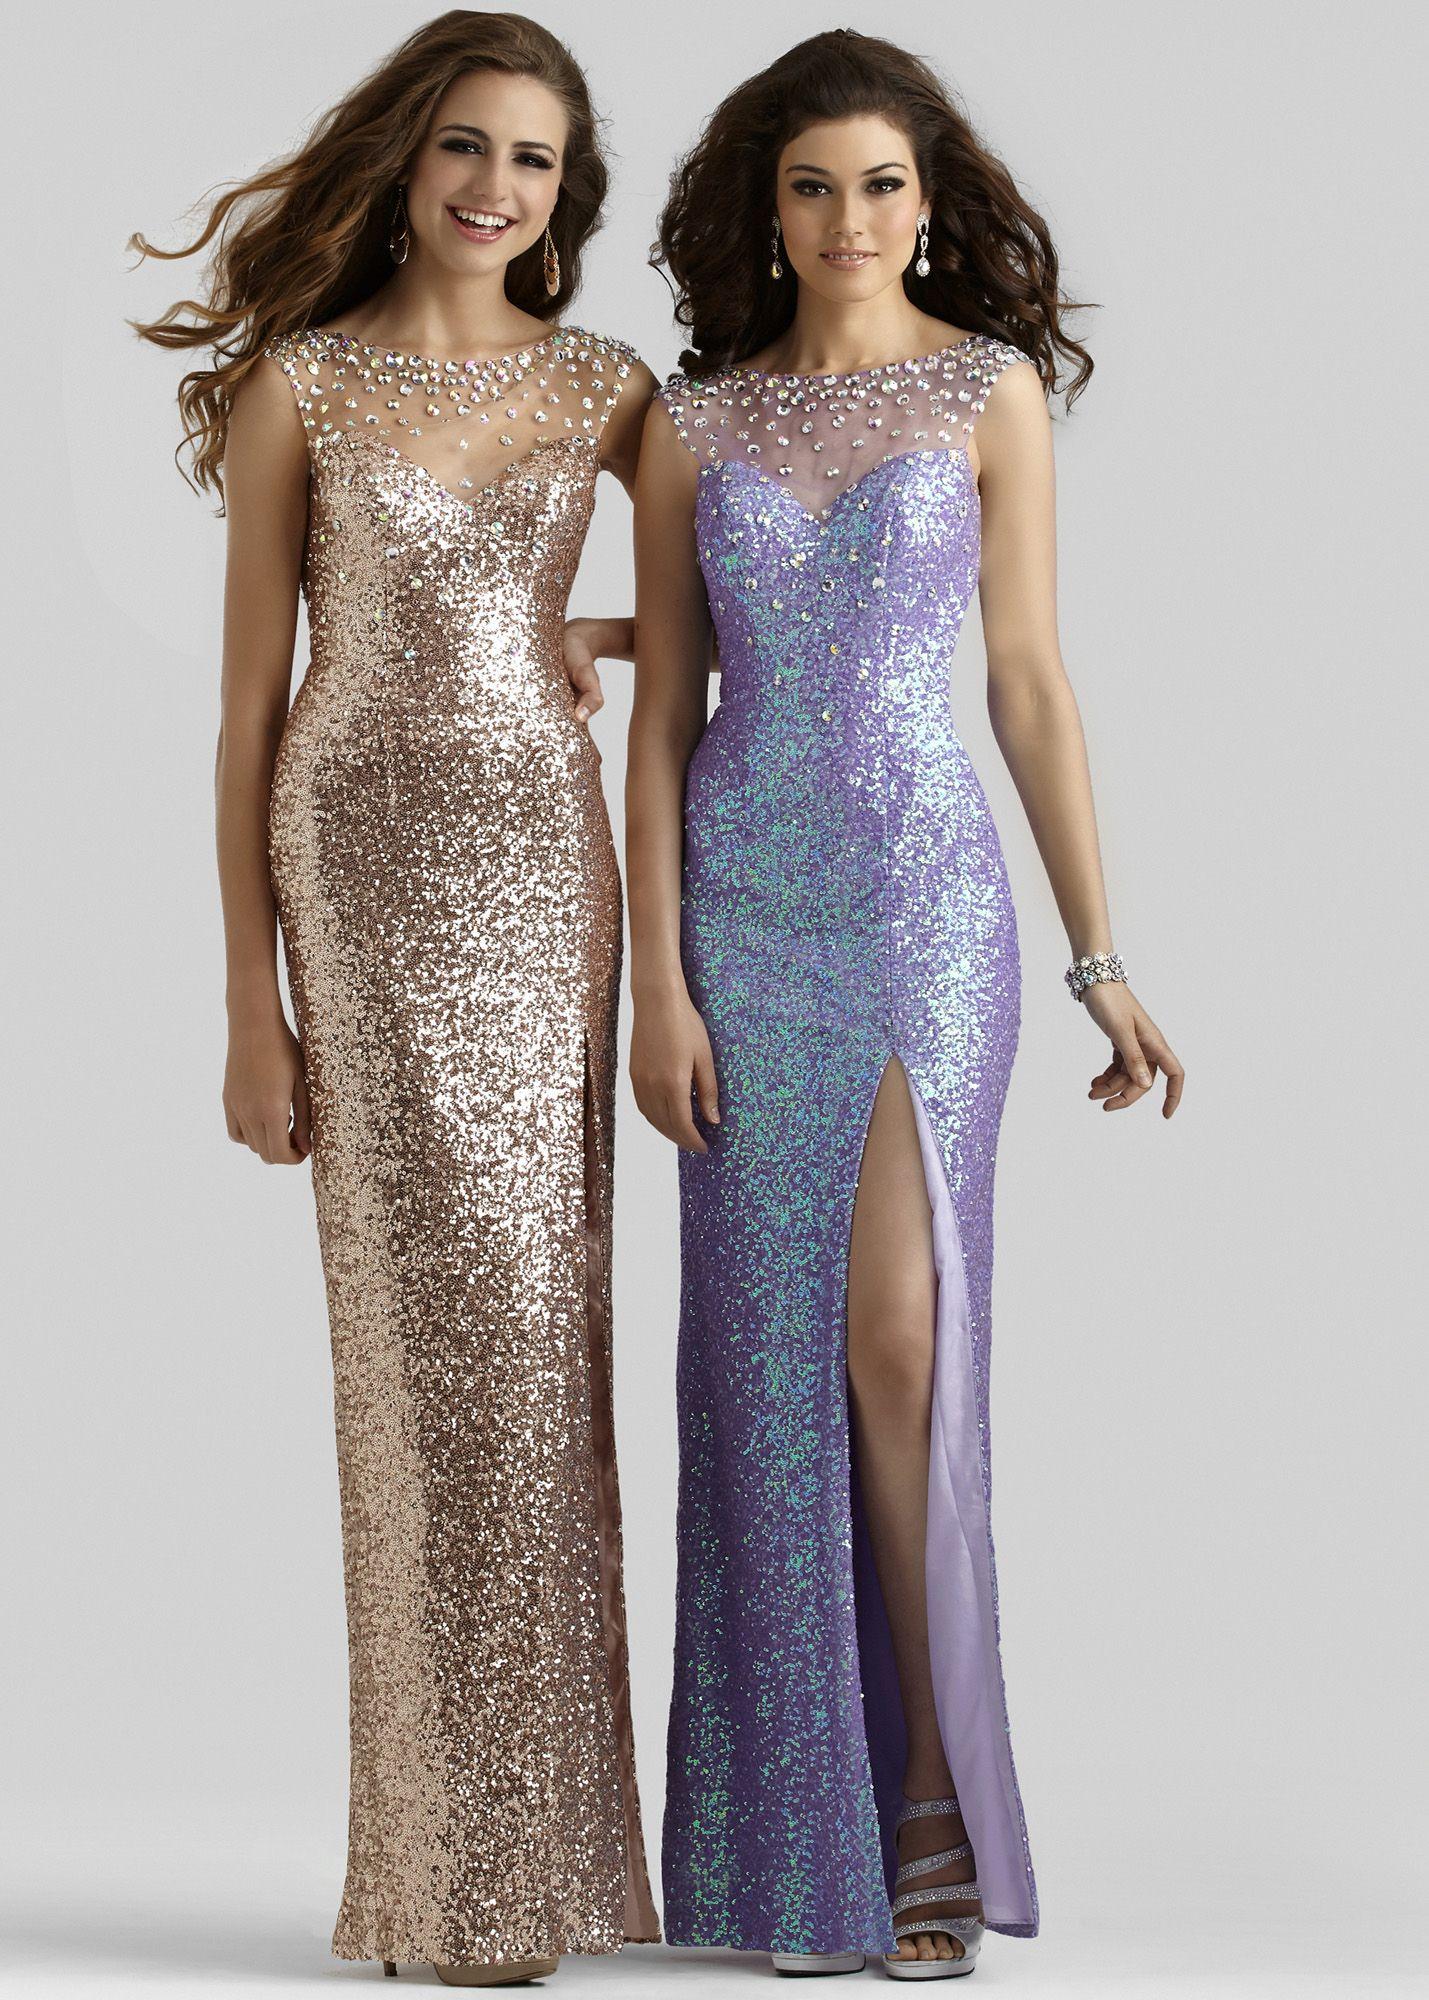 Clarisse 2350 Sequin Rose Gold and Princess Purple Evening